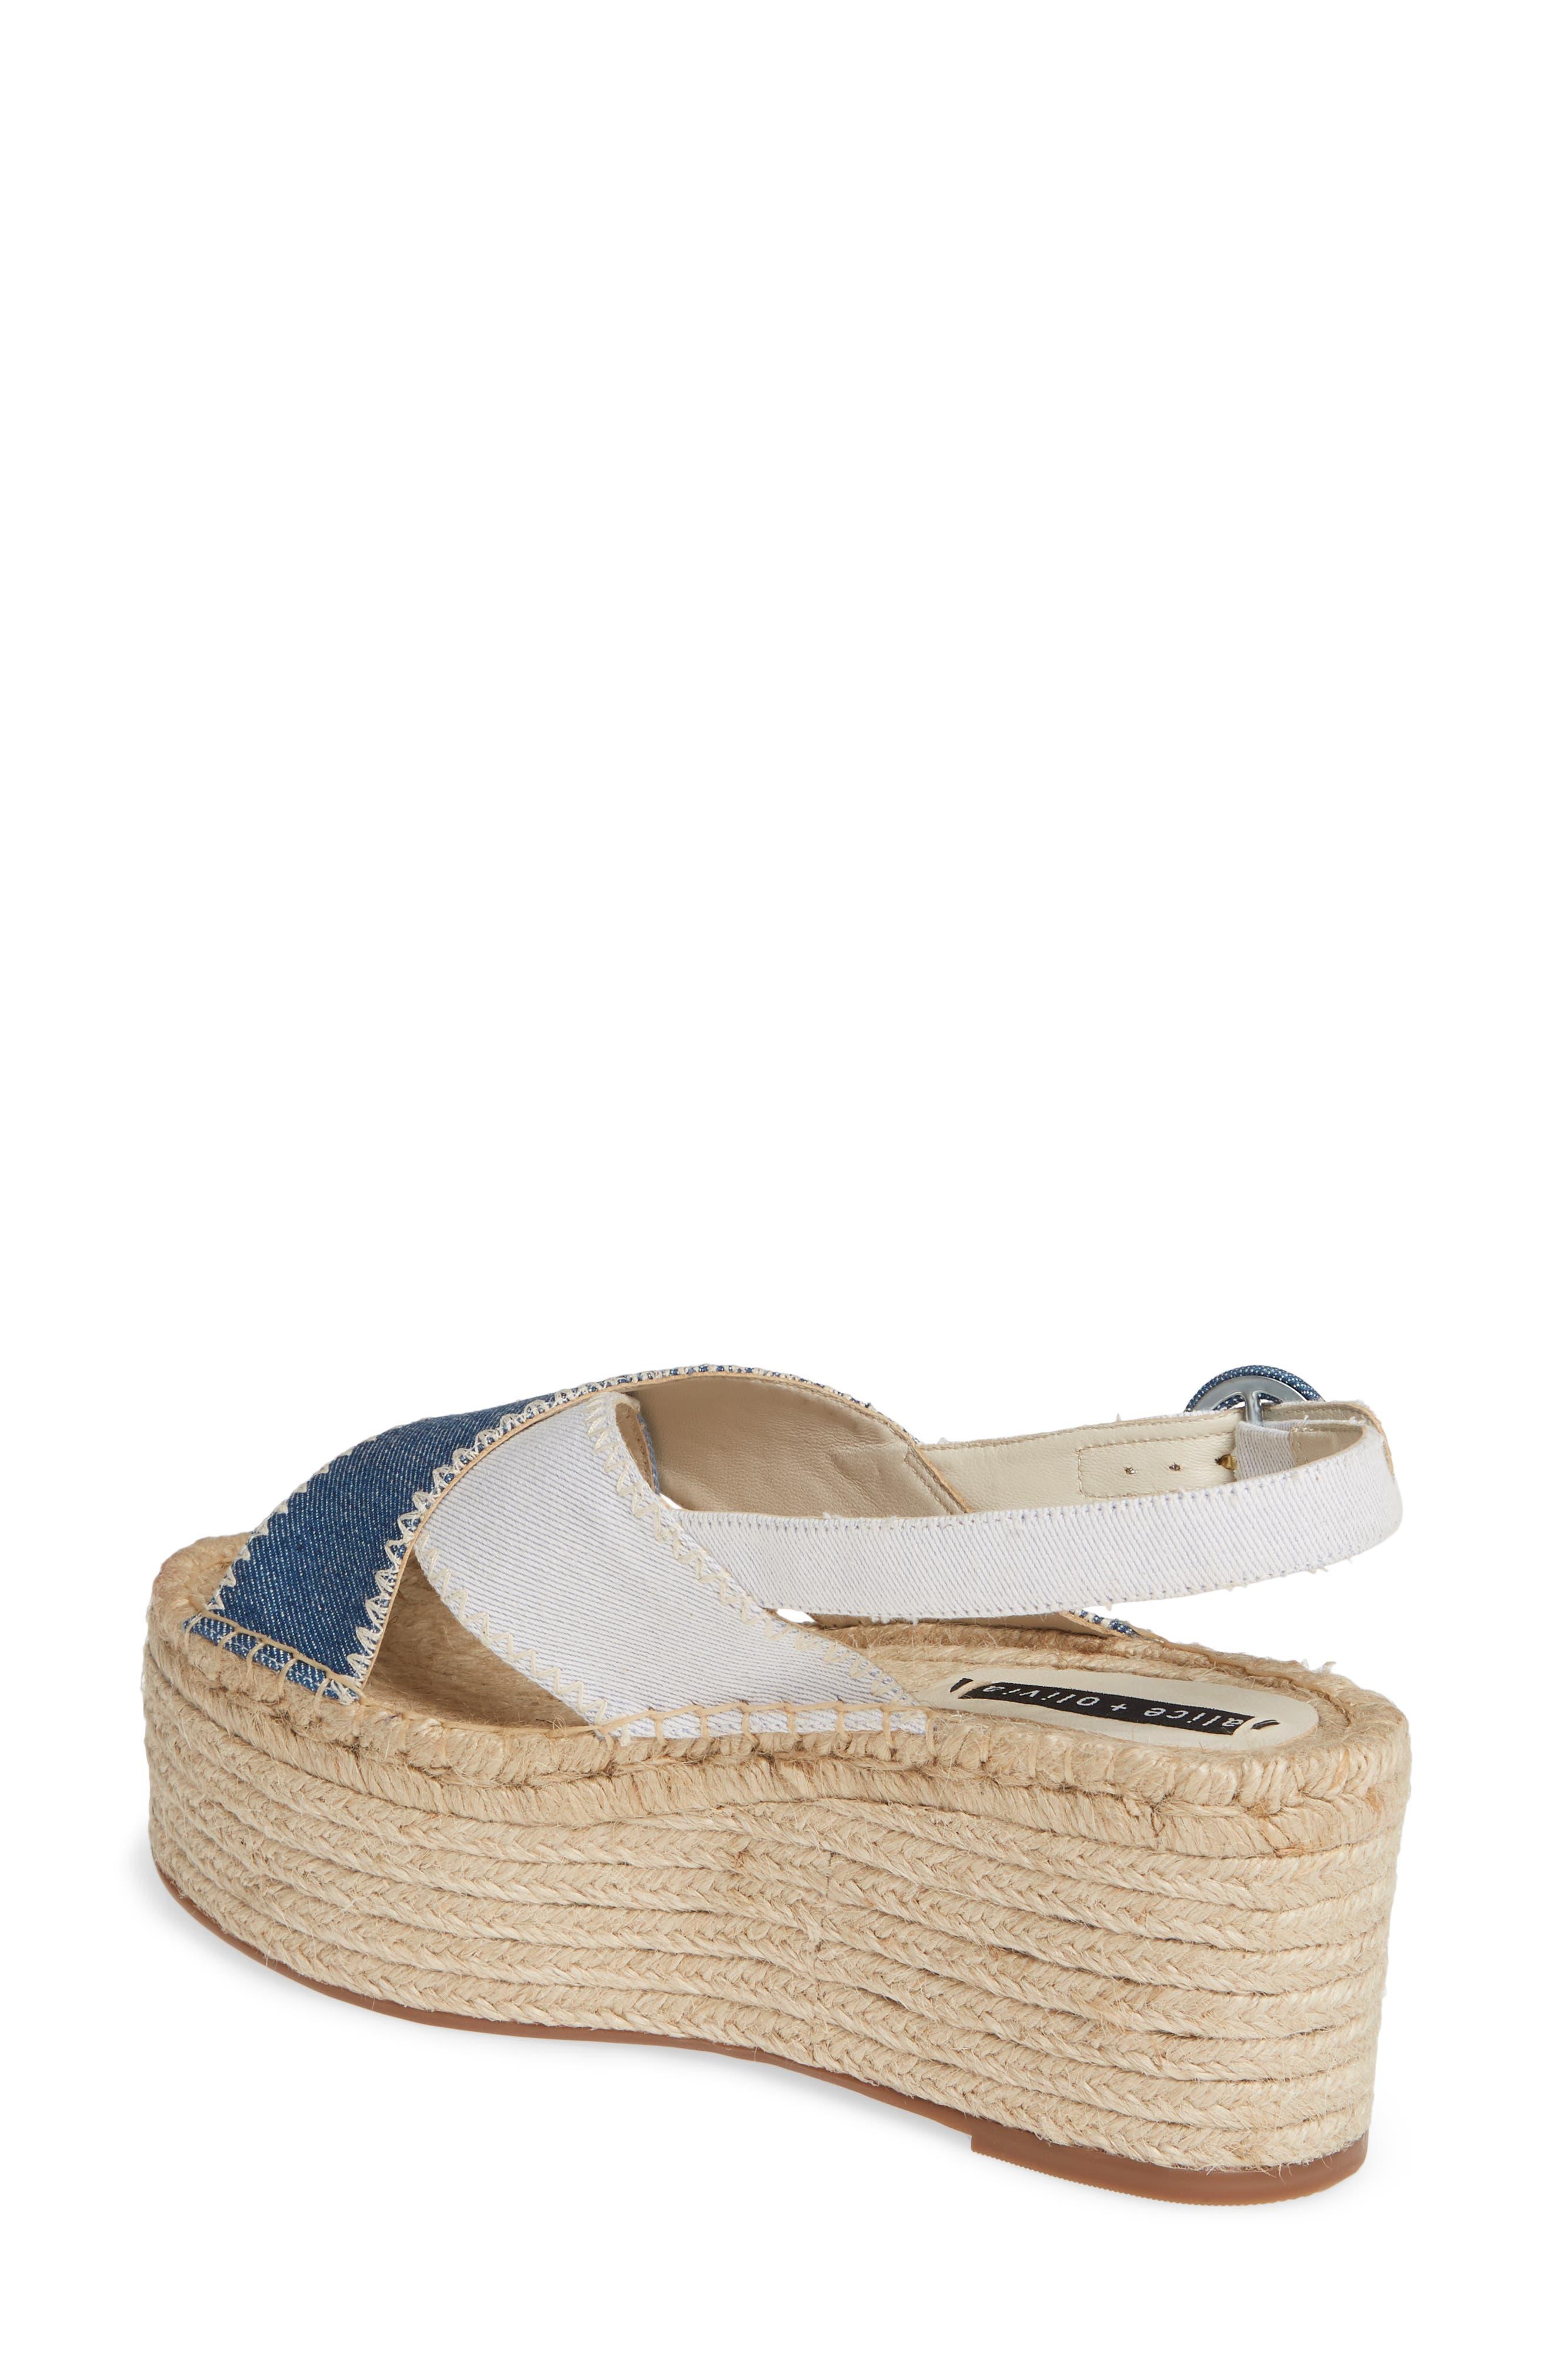 ALICE + OLIVIA, Fayen Platform Sandal, Alternate thumbnail 2, color, DARK BLUE/ LIGHT BLUE/ IVORY